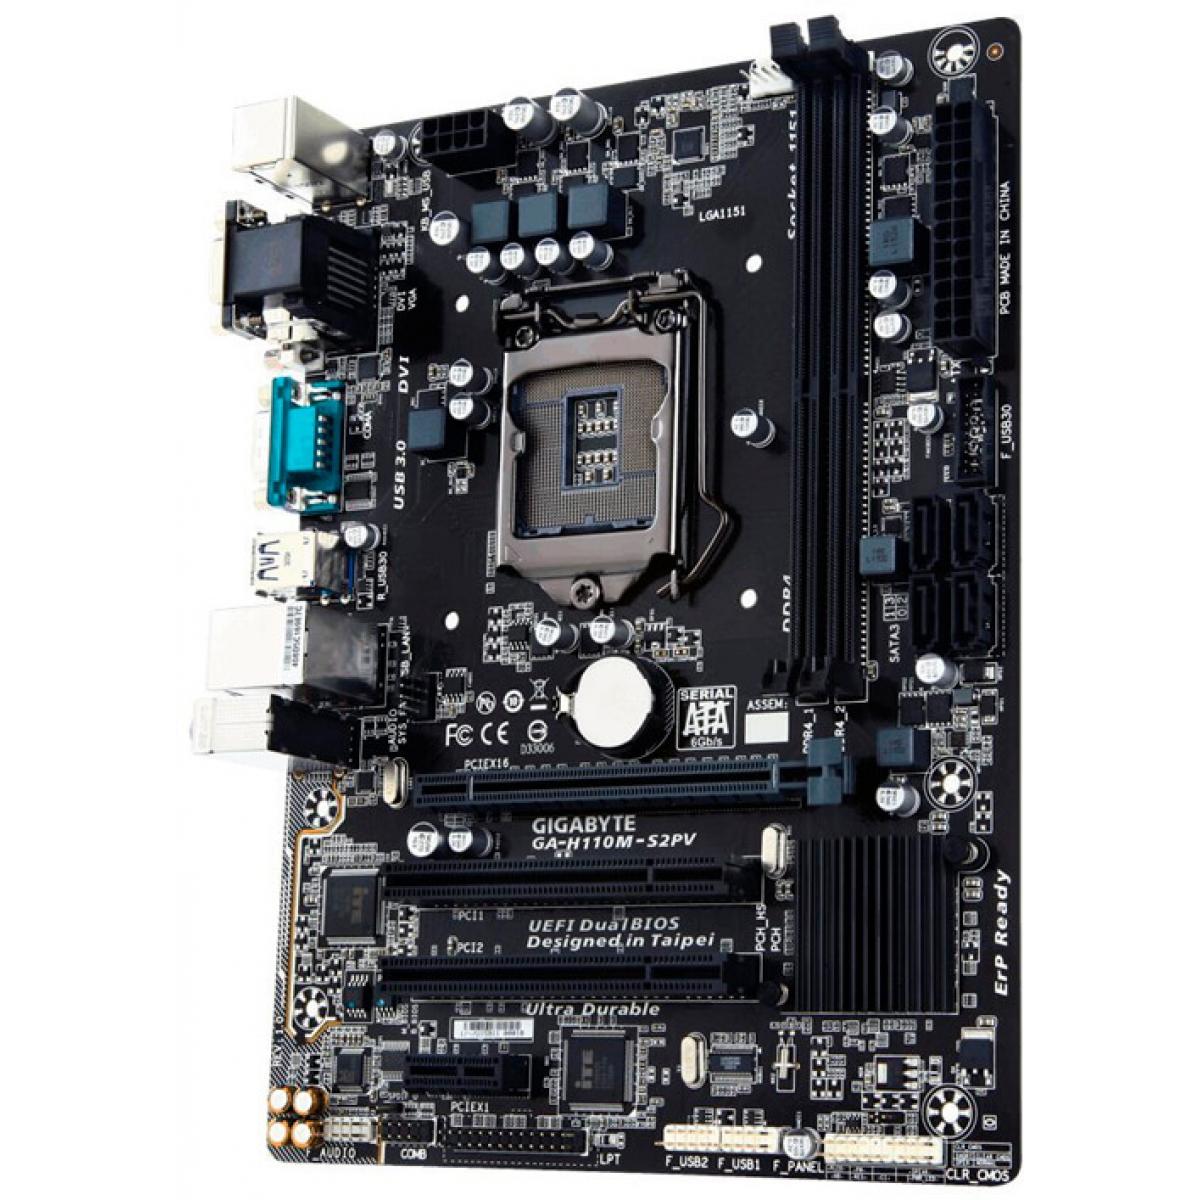 Placa Mãe Gigabyte GA-H110M-S2PV, Chipset H110, Intel LGA 1151, mATX, DDR4